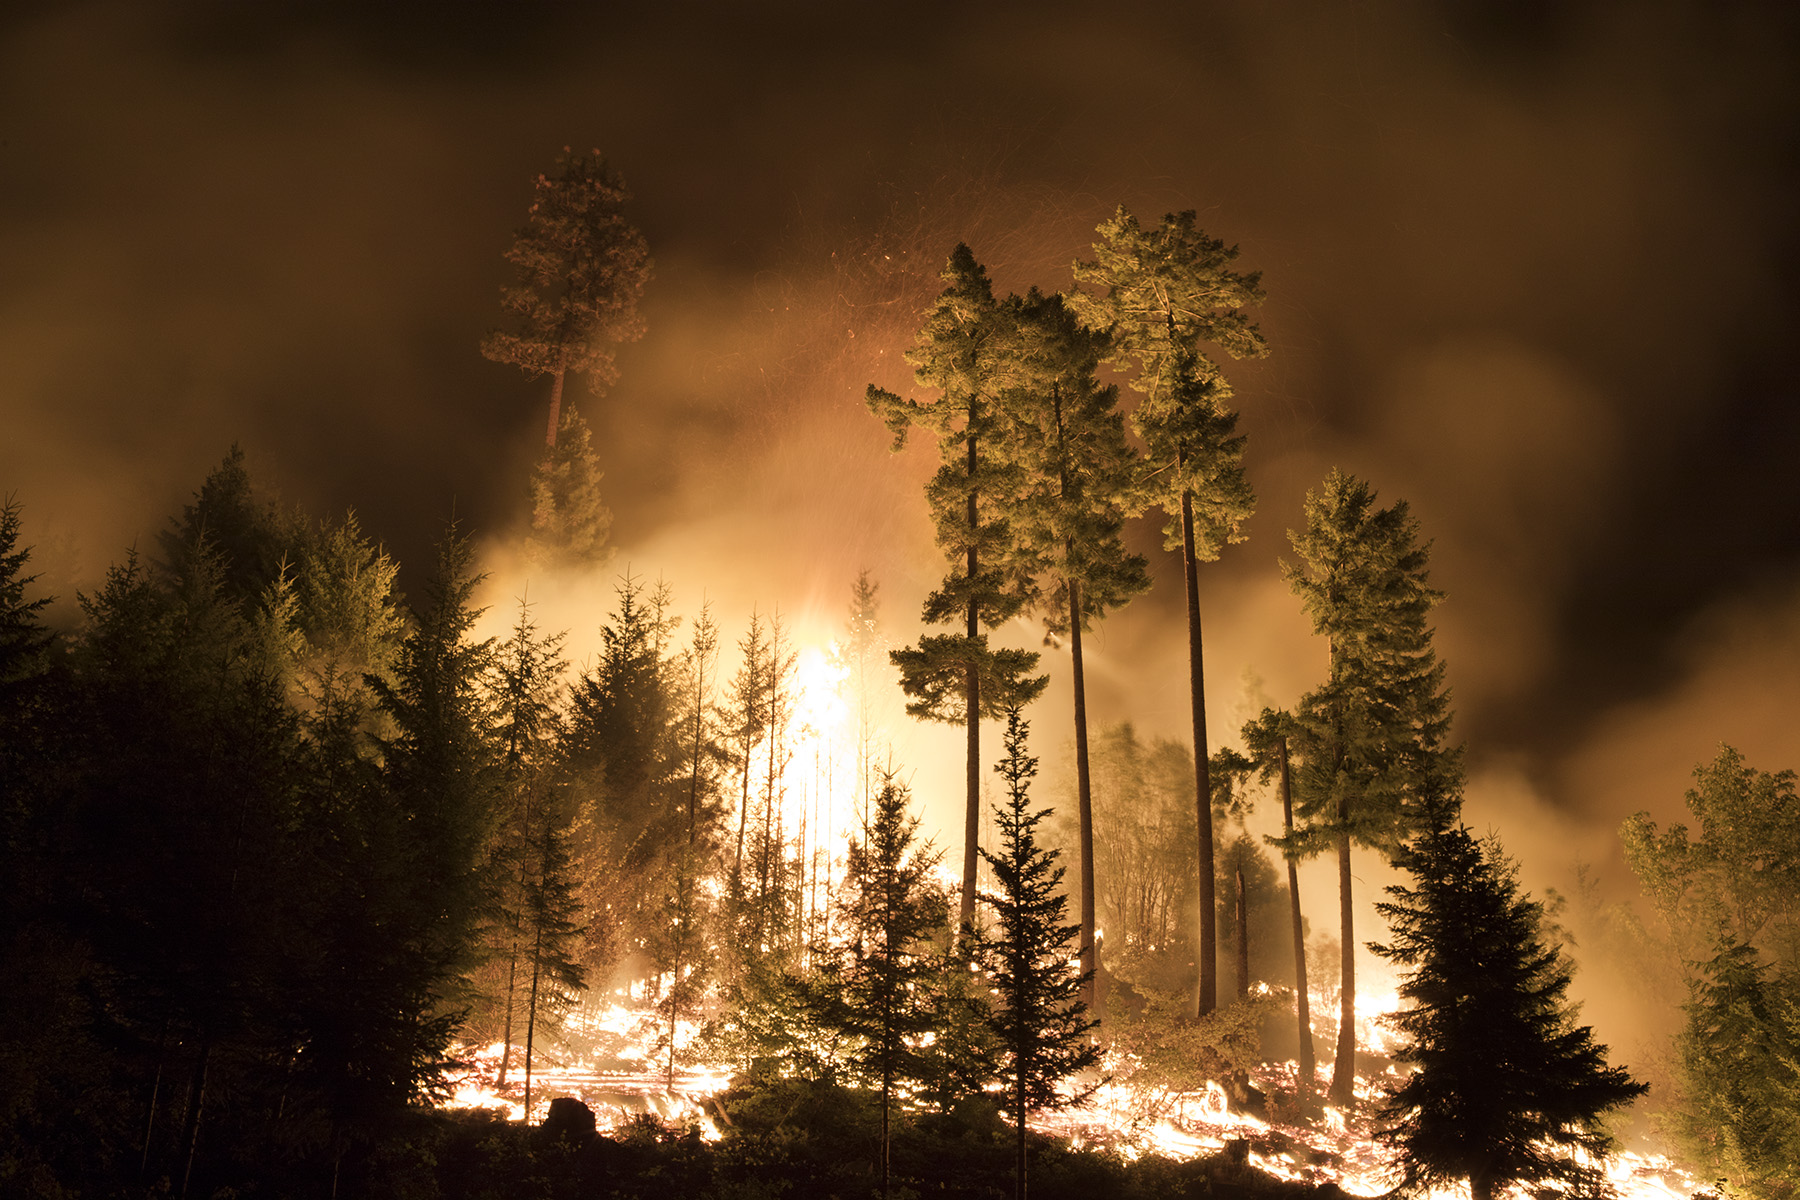 The Jolly Mountain fire burns through the night earlier this year. Photo © John Marshall